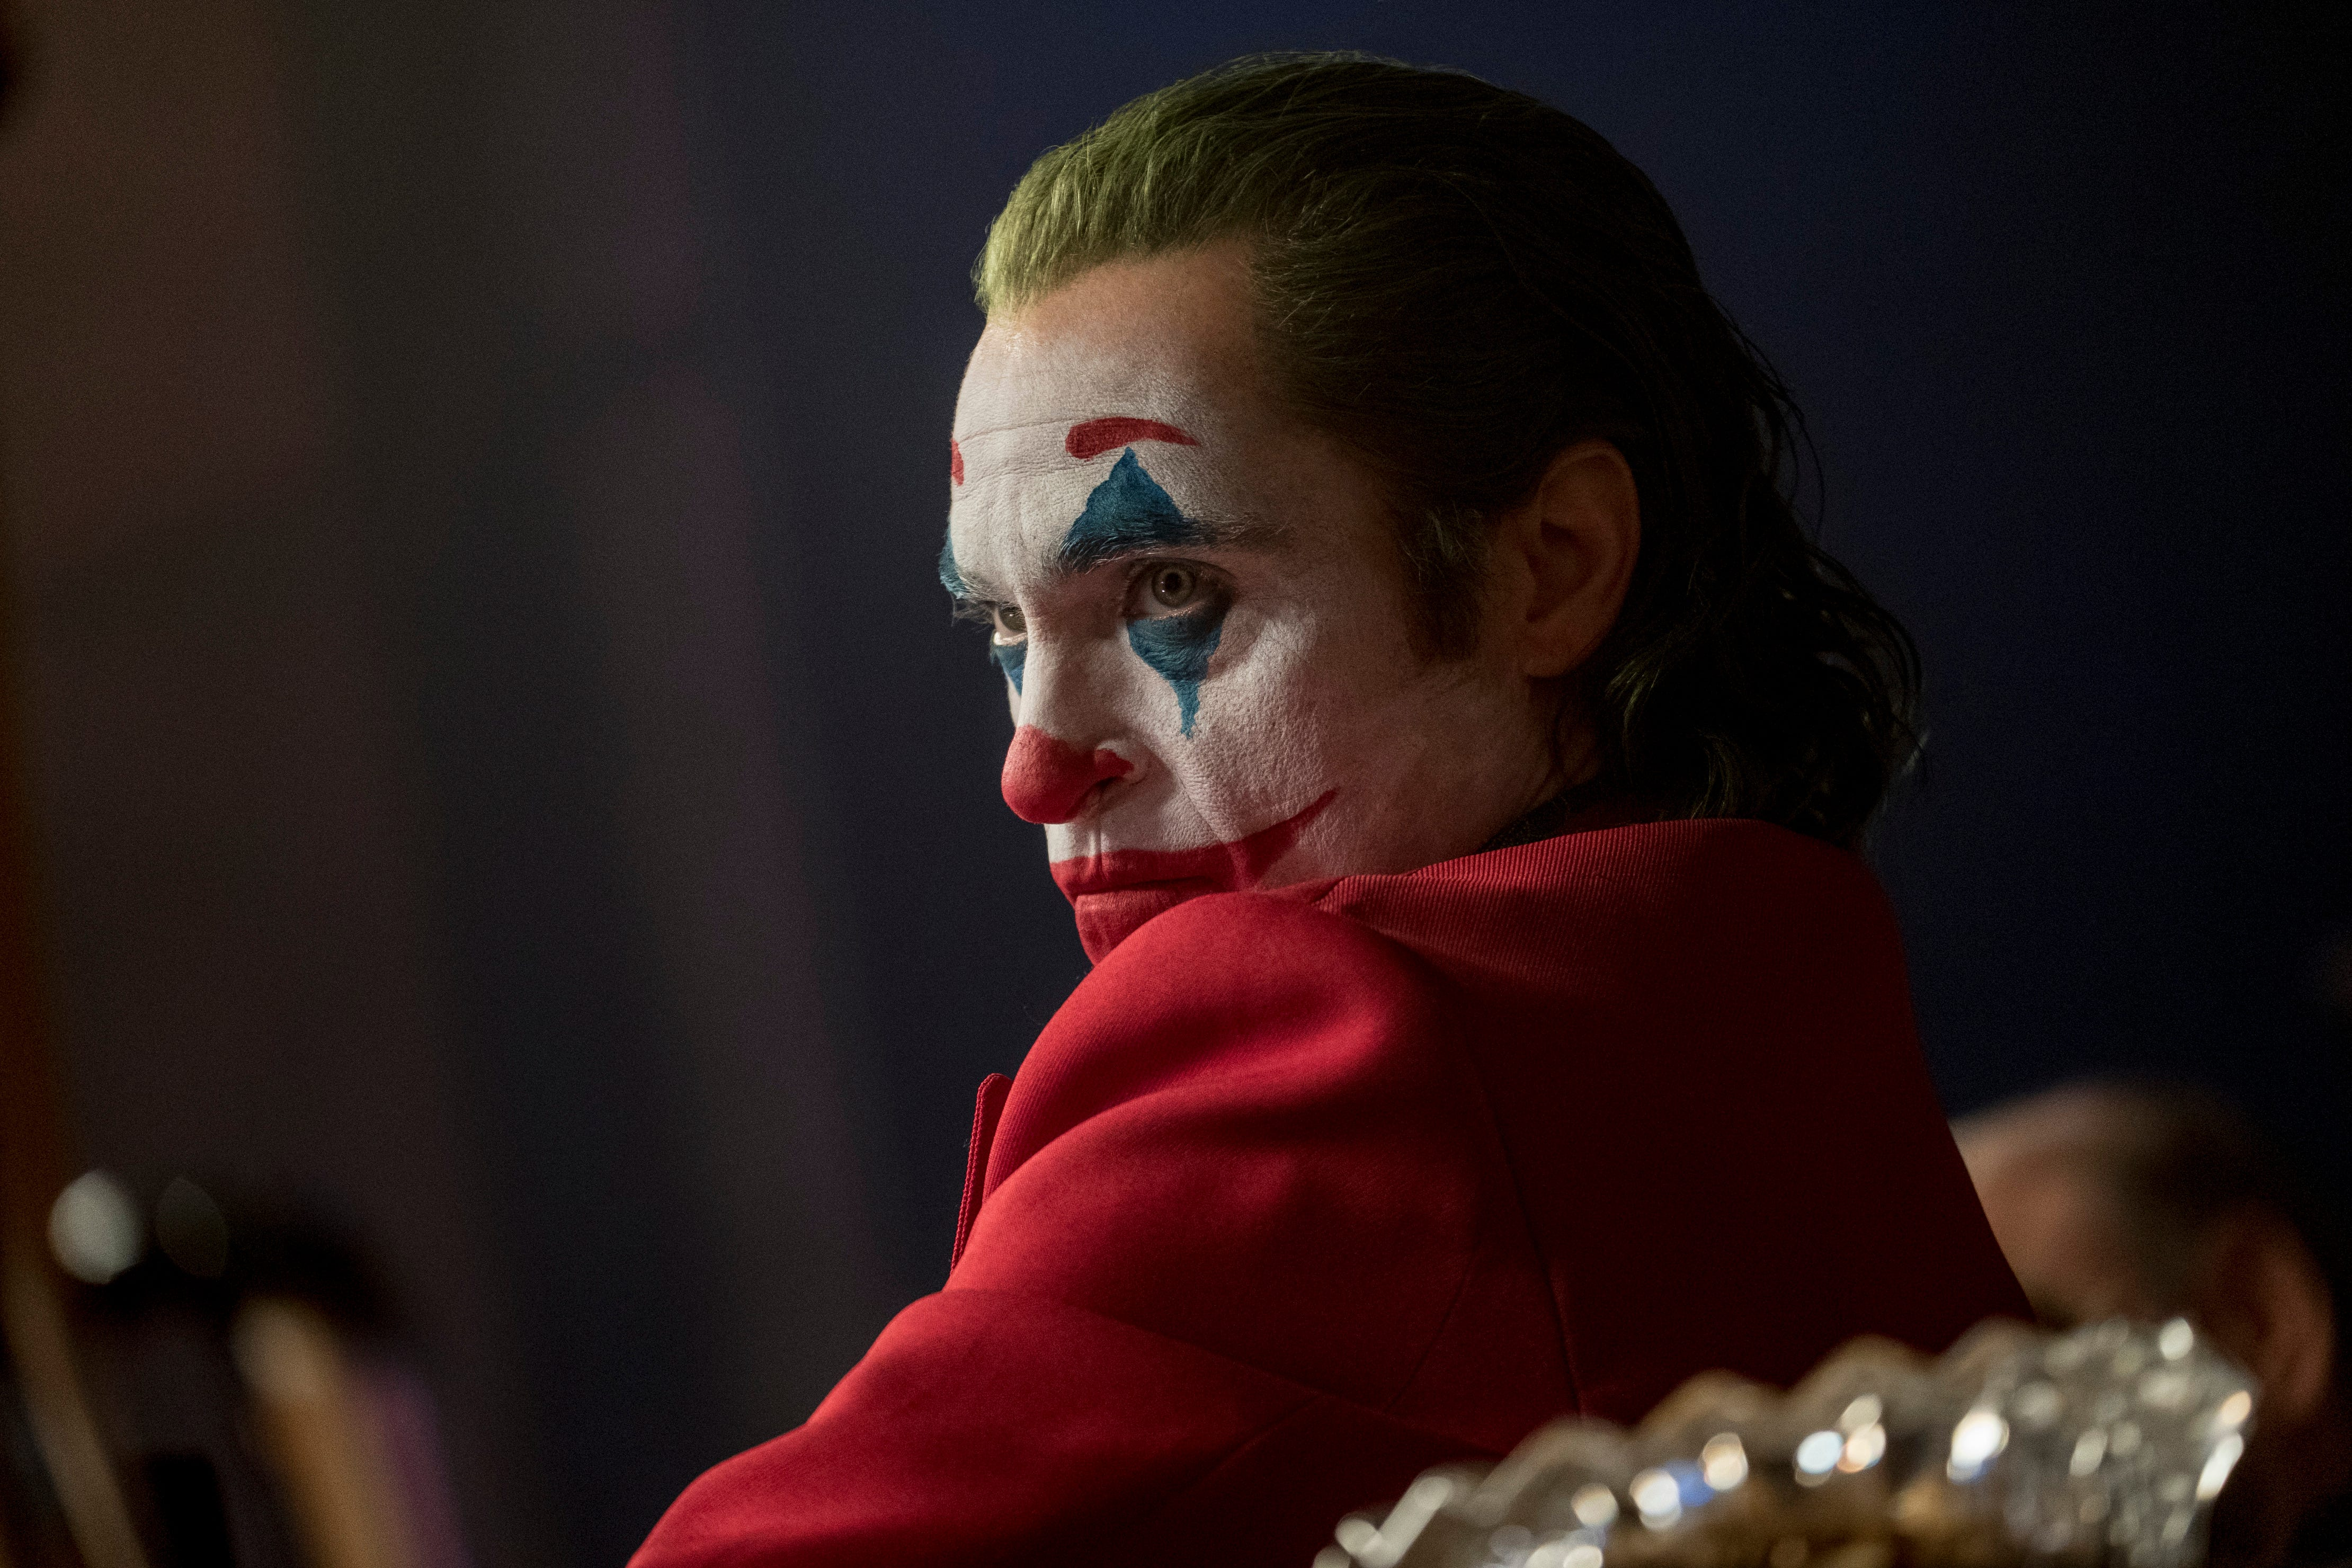 joker 2020 box office